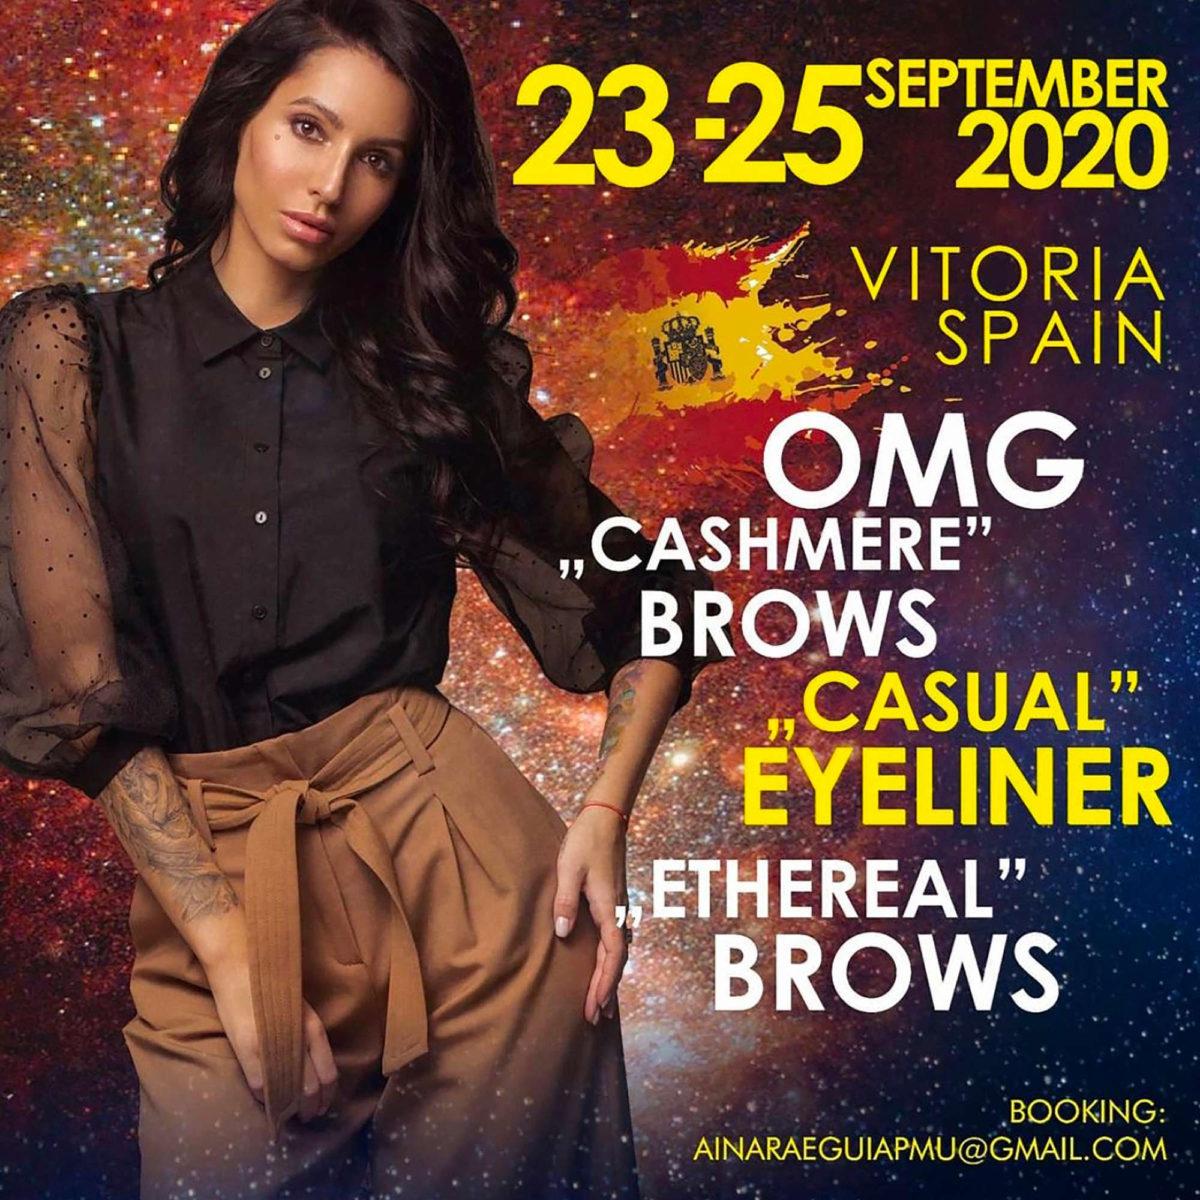 Cashmere Brows Casual Eyeliner y Ethereal con Oksana Martynenko ainara eguia micropigmentacion bilbao vitoria lekeitio madrid